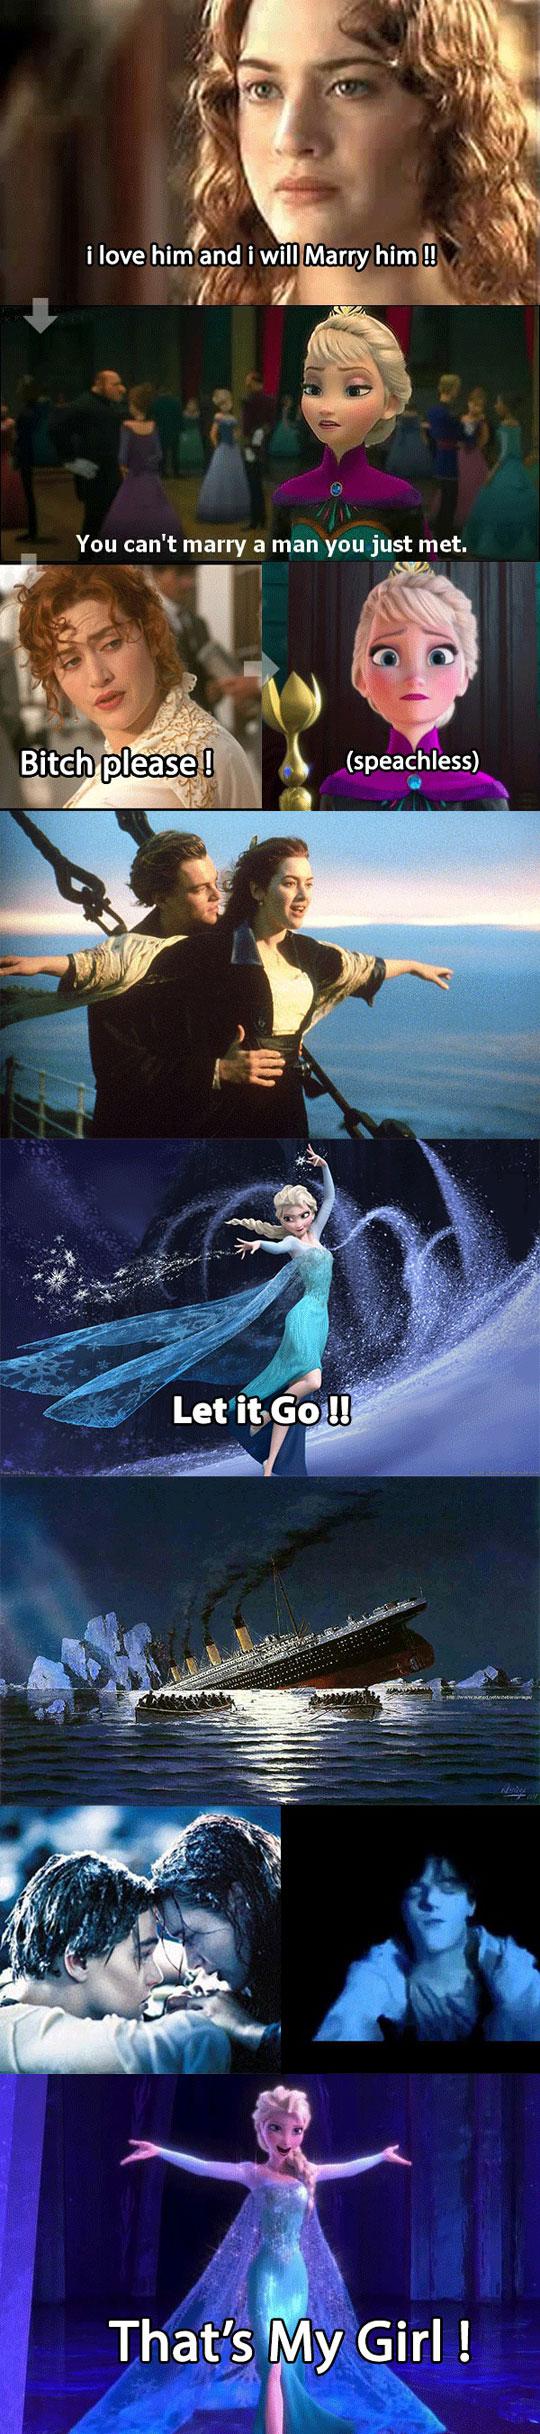 Elsa Joins Titanic Funny Pictures Hilarious Titanic